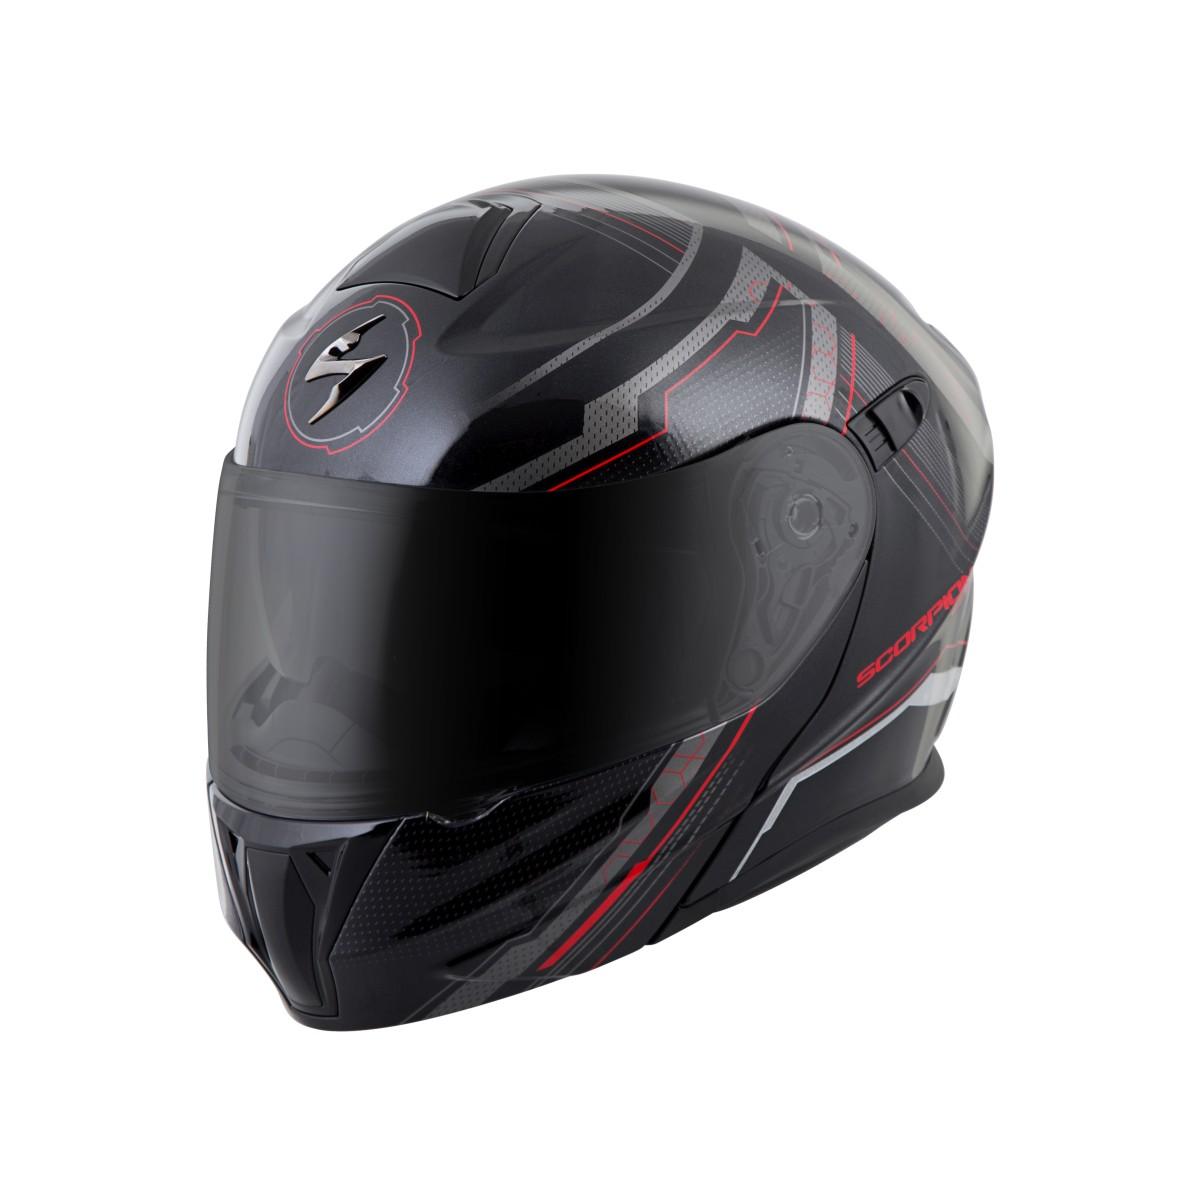 scorpion exo gt920 satellite modular motorcycle helmet ebay. Black Bedroom Furniture Sets. Home Design Ideas